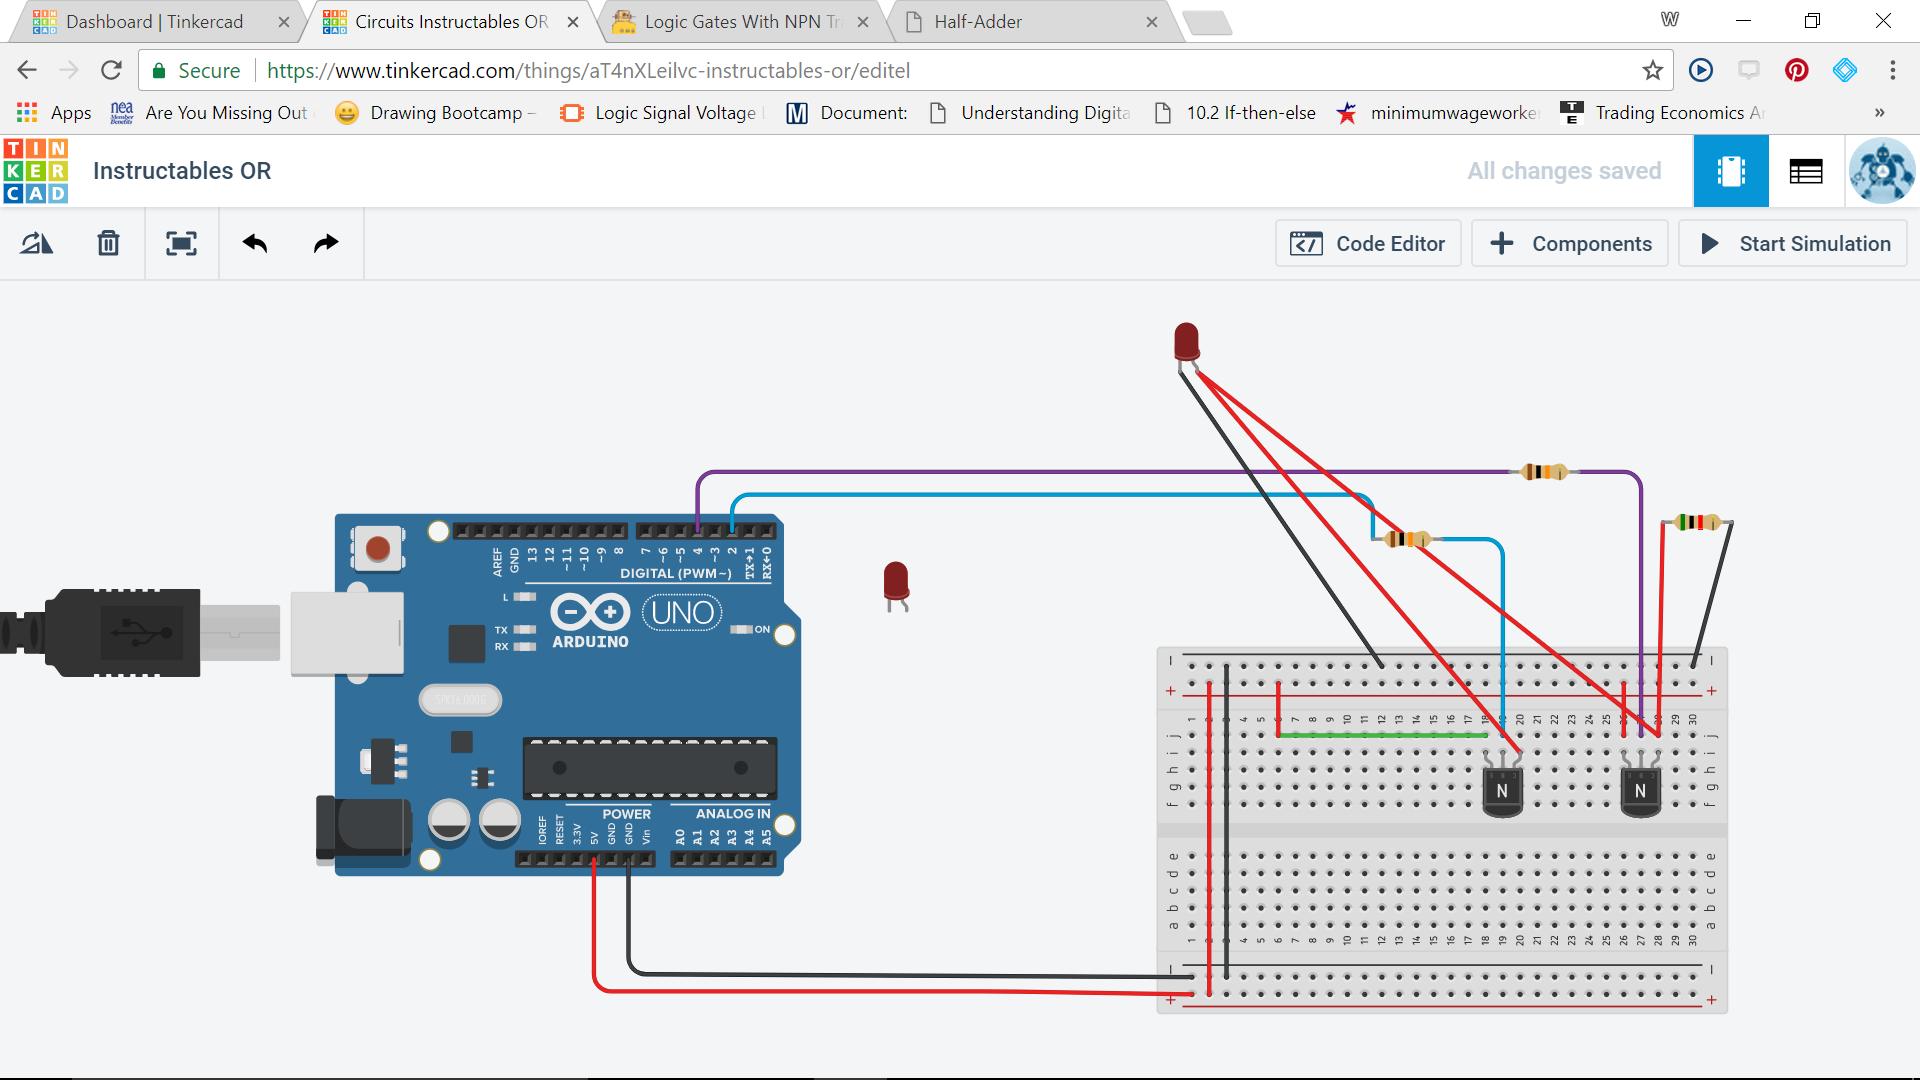 Logic Gates With NPN Transistors